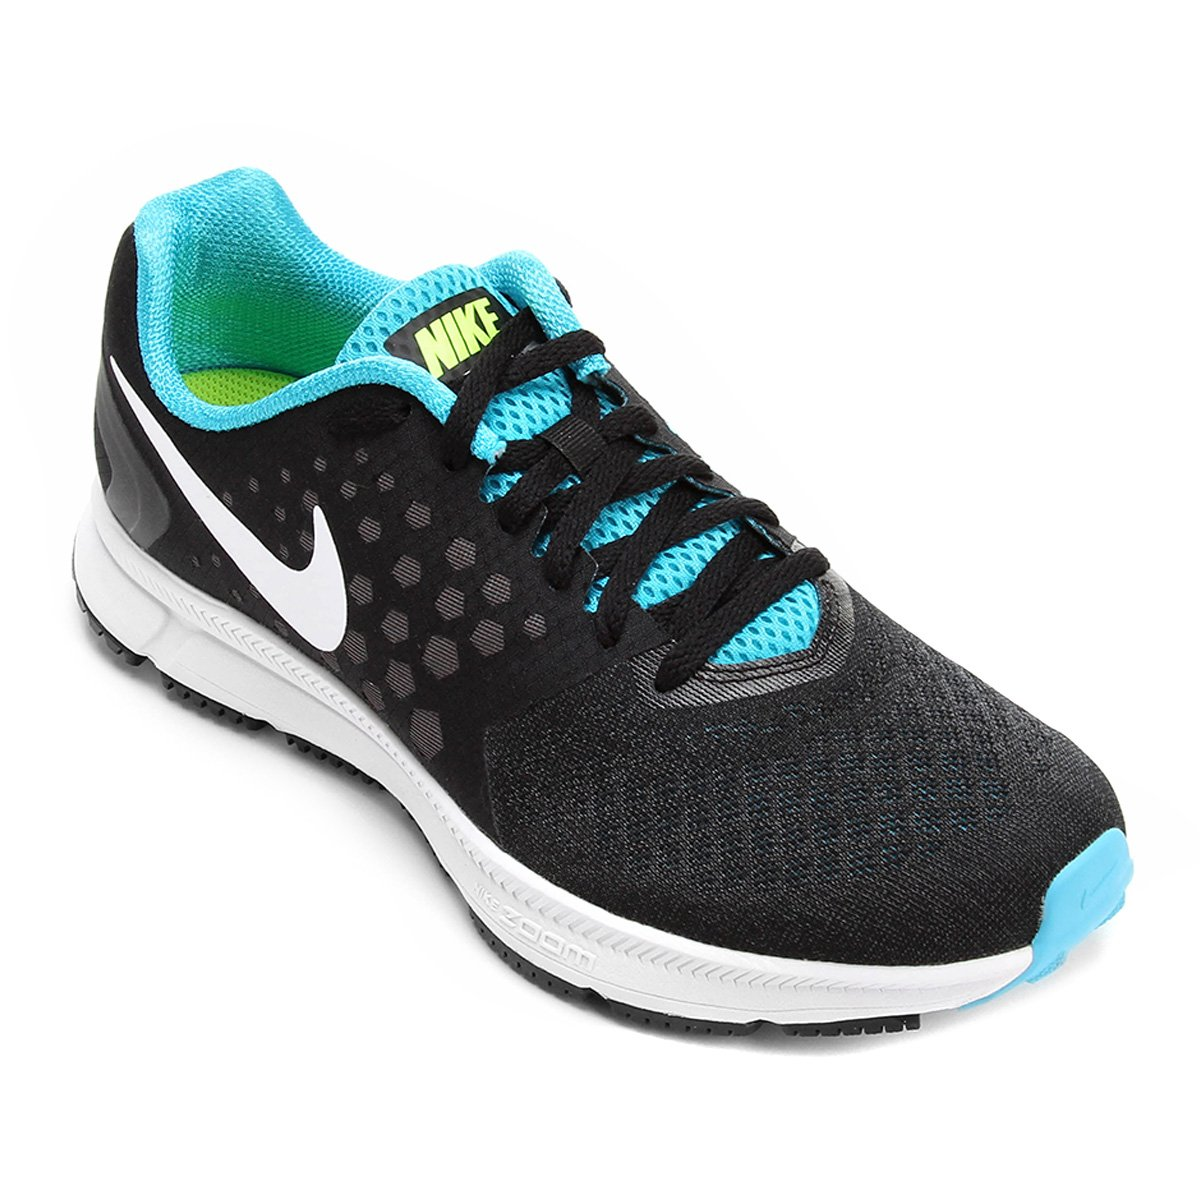 62387a1f20 Tênis Nike Air Zoom Span Masculino   Loja do Inter